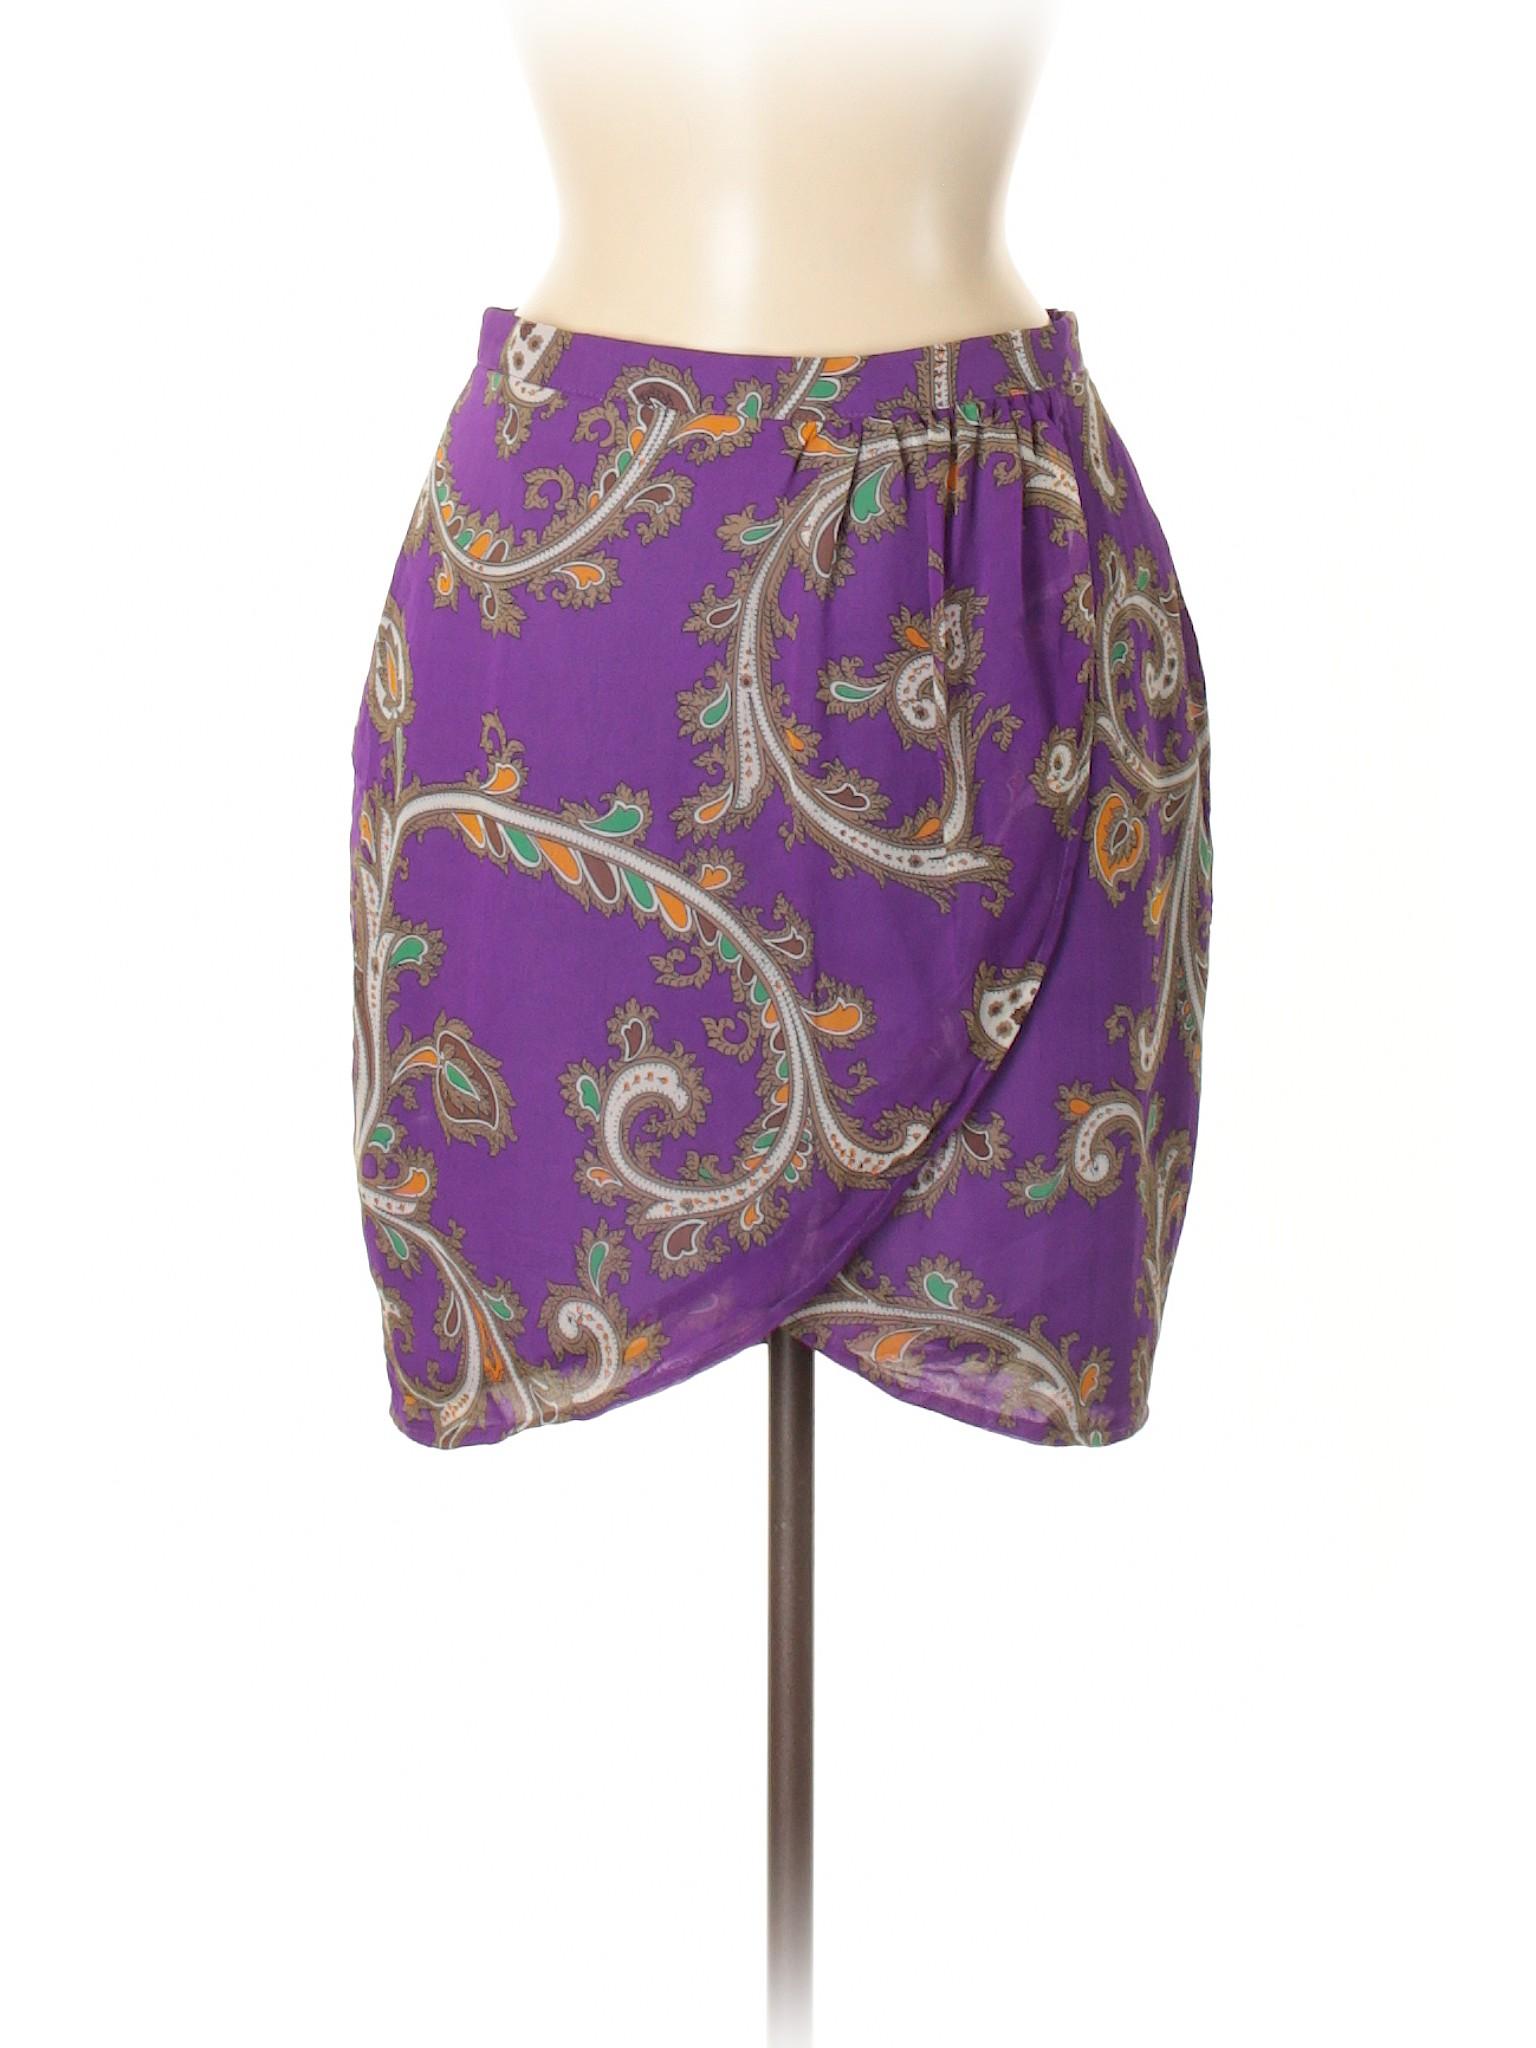 Casual Skirt Boutique Skirt Skirt Casual Boutique Boutique Boutique Casual YIUwqI